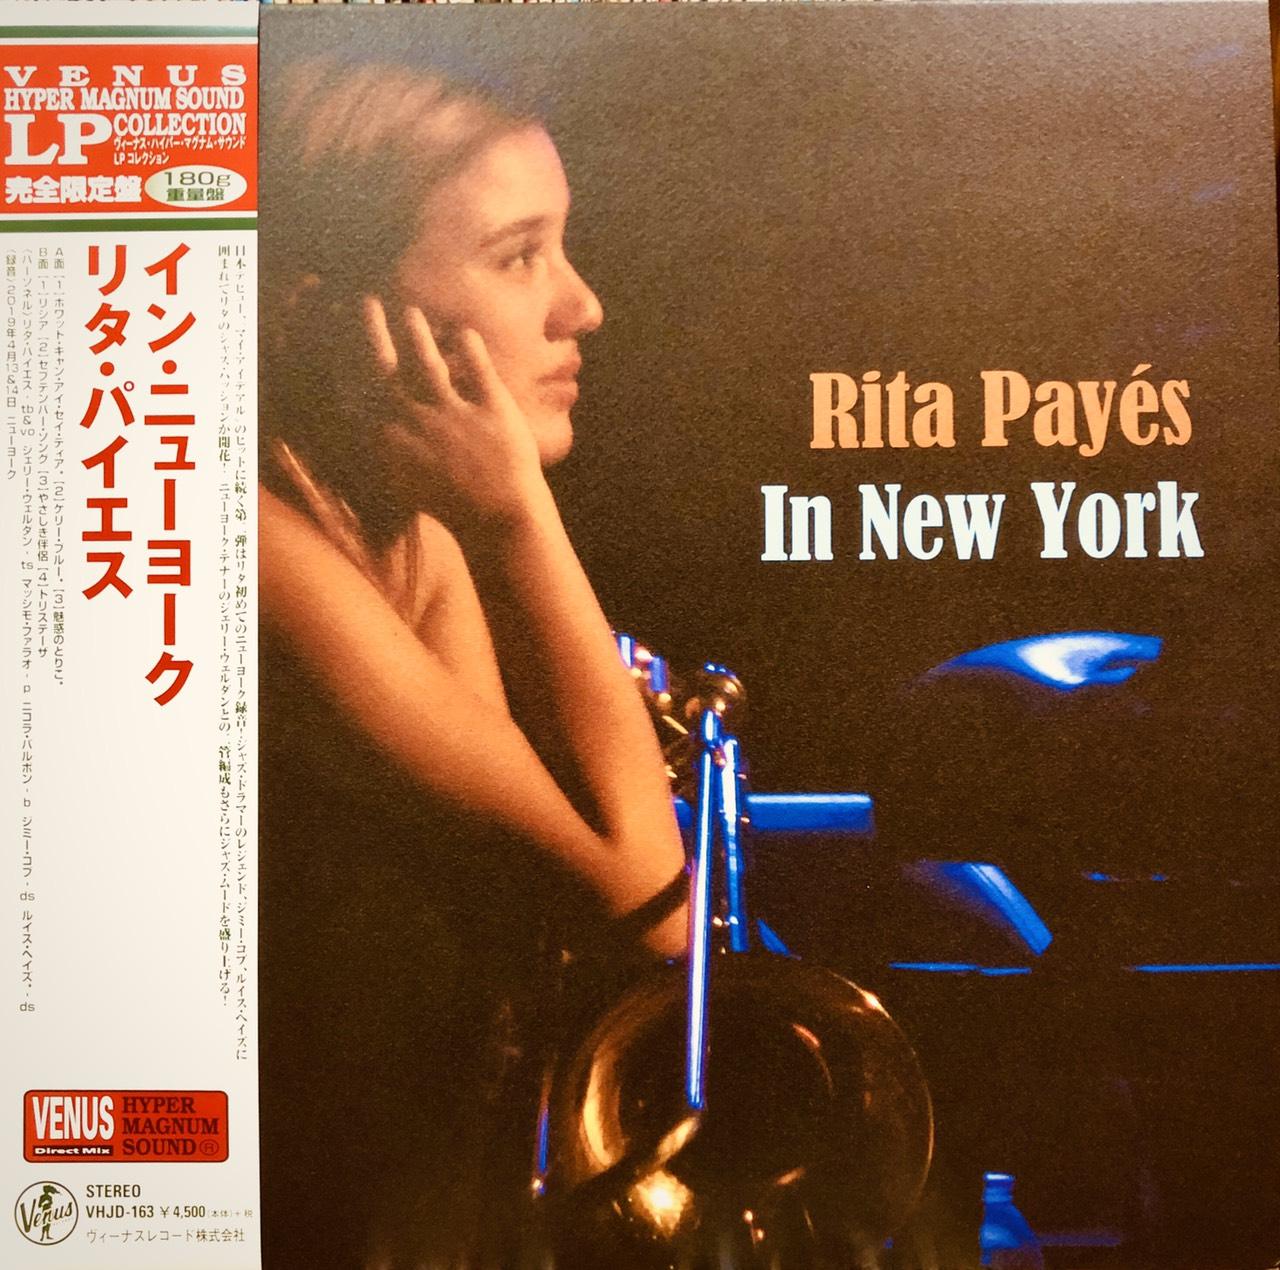 dia-than-lp-rita-payes-in-new-york